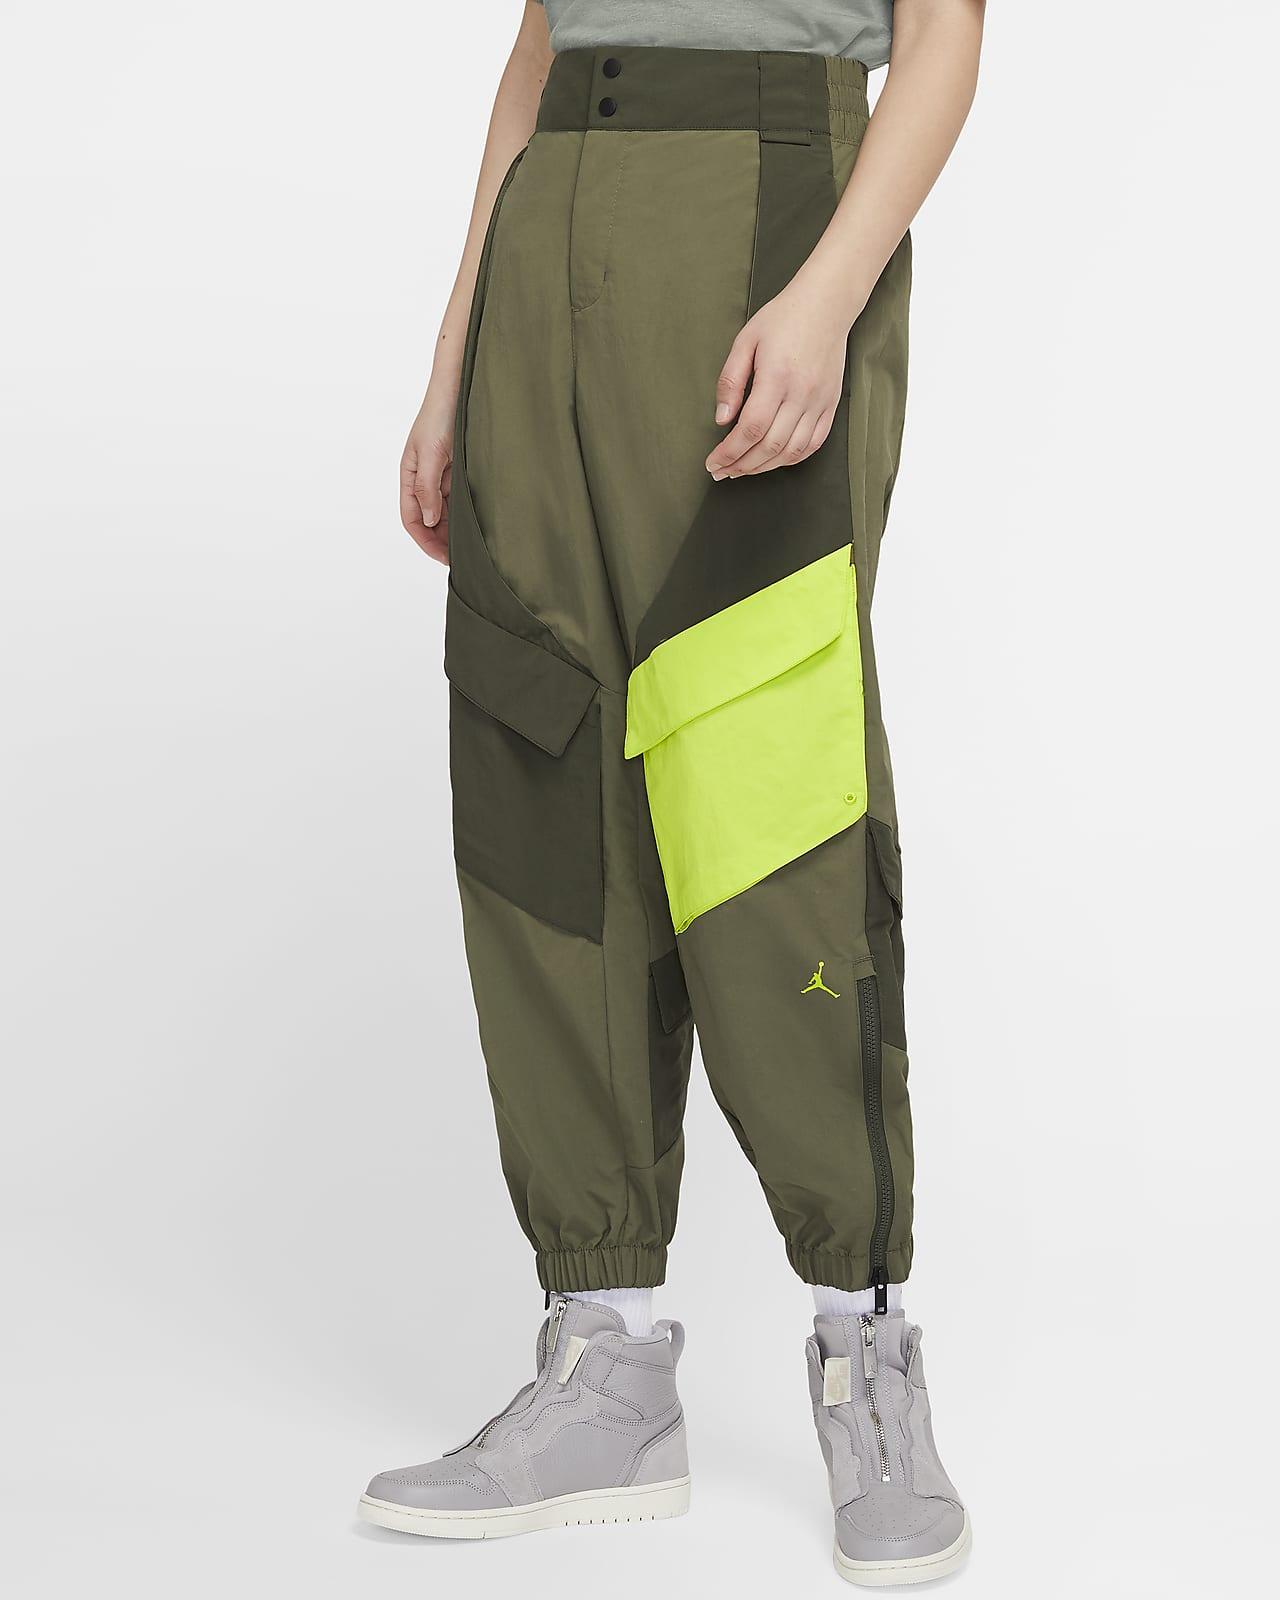 Jordan Women's Utility Pants. Nike JP